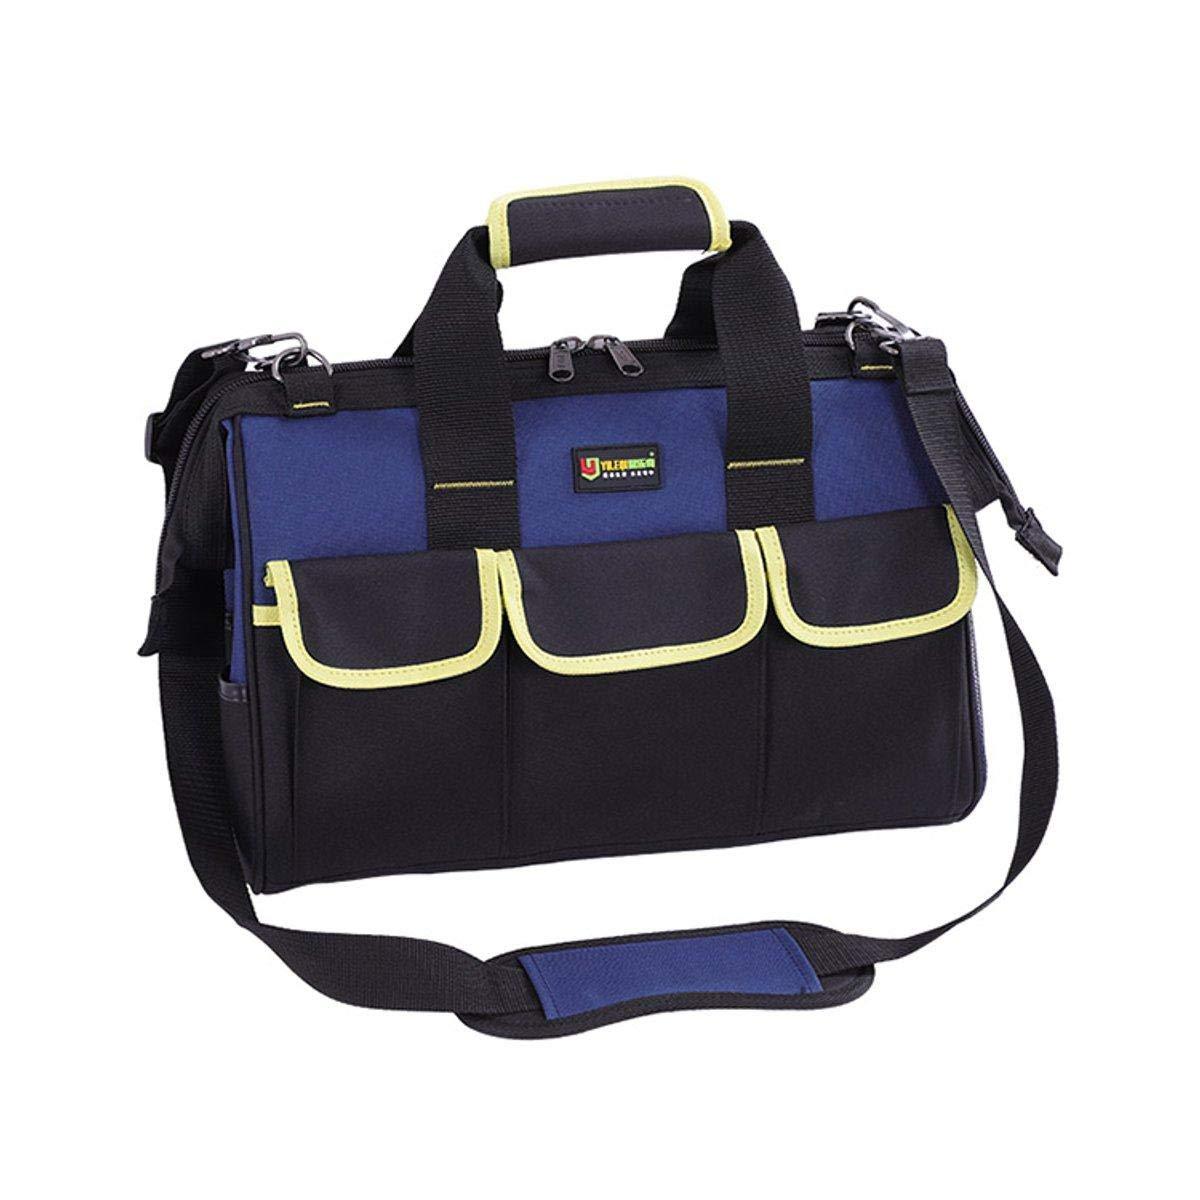 14inch 16inch Tool Bag Heavy Duty Oxford Pouch Case Holder Waterproof Pocket (16 inch)